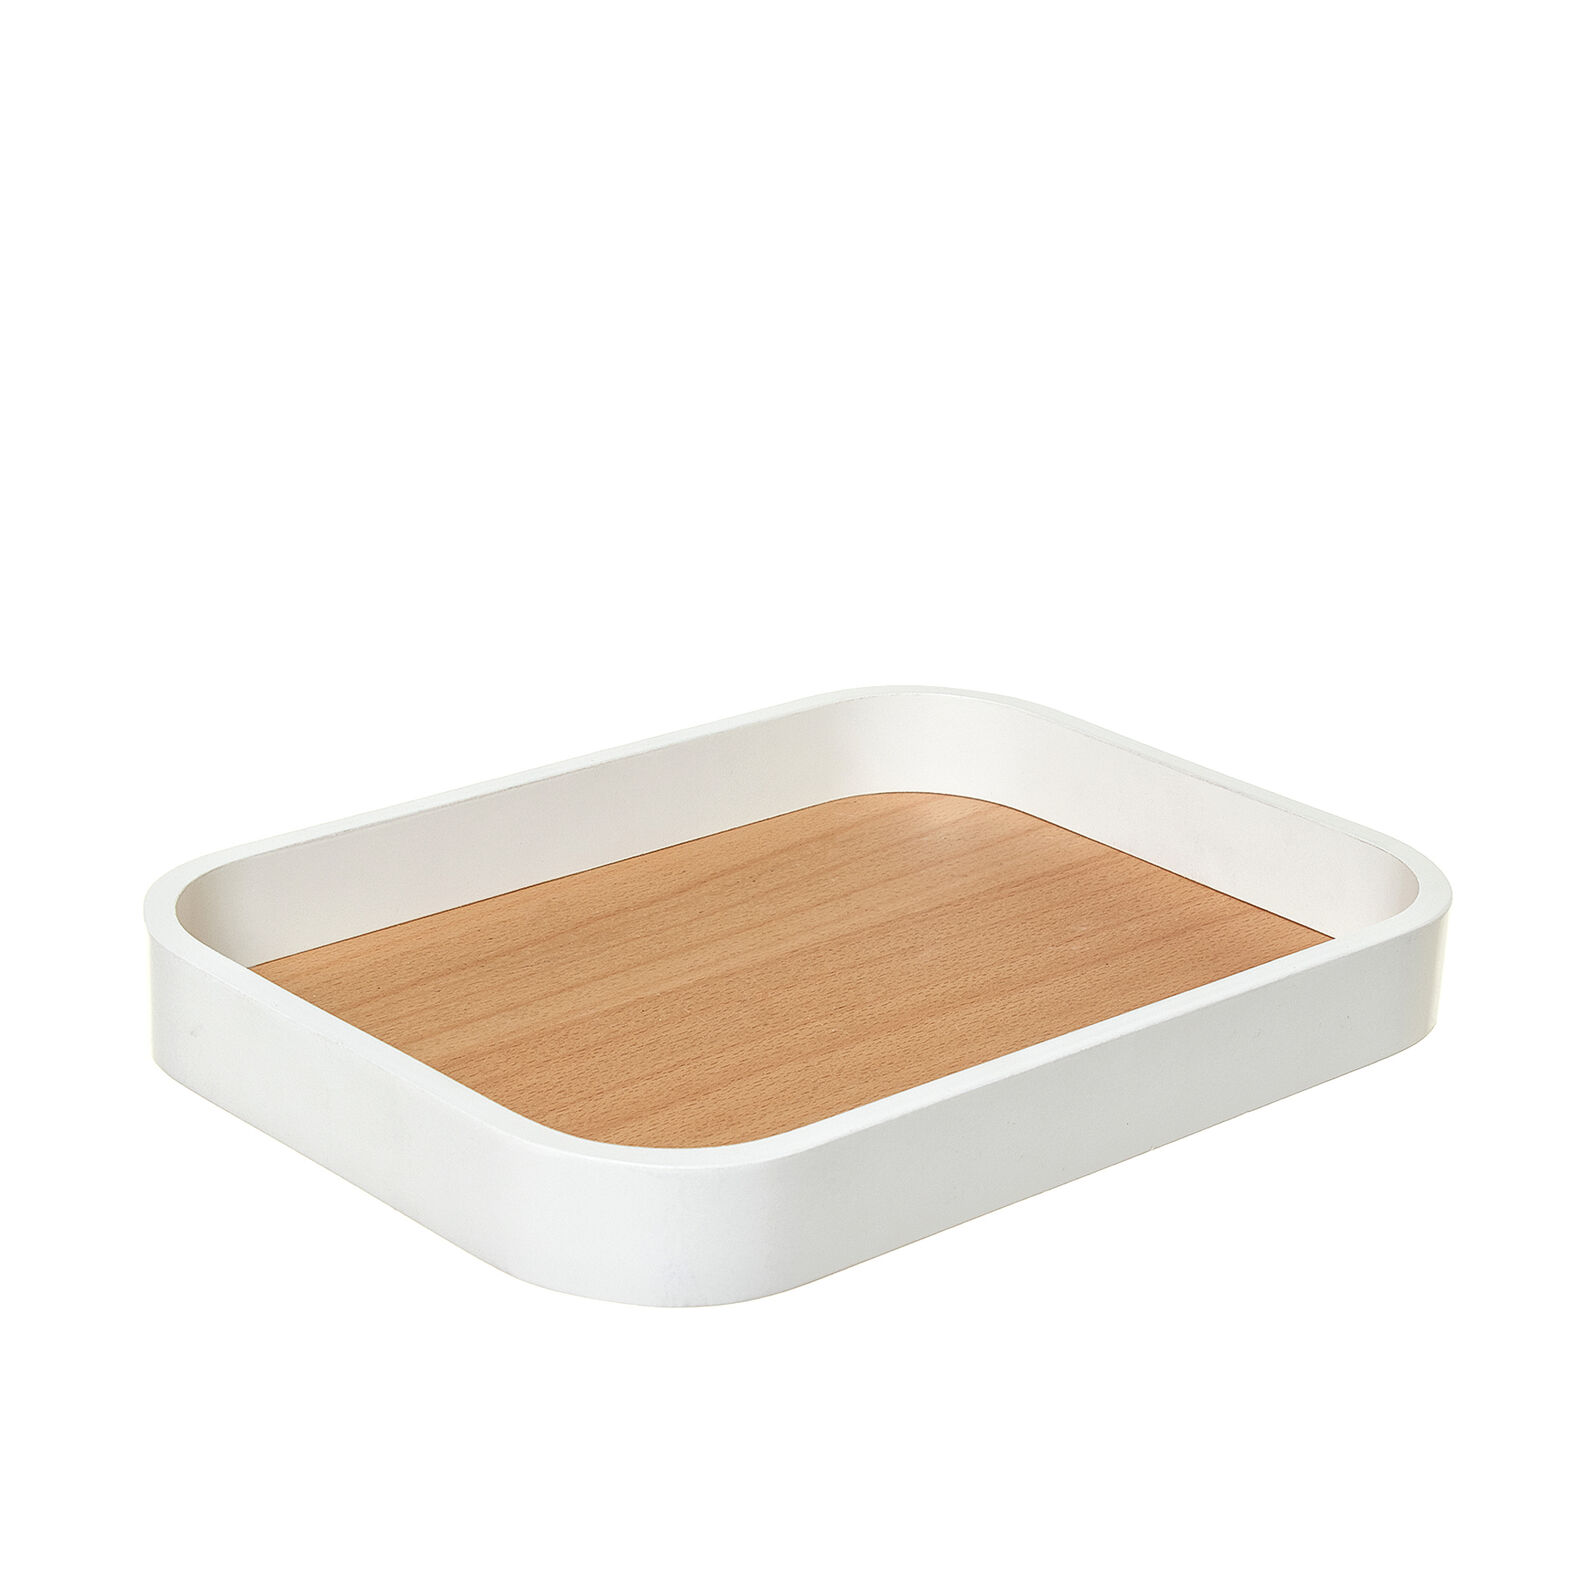 Loft decorative tray with walnut-effect surface